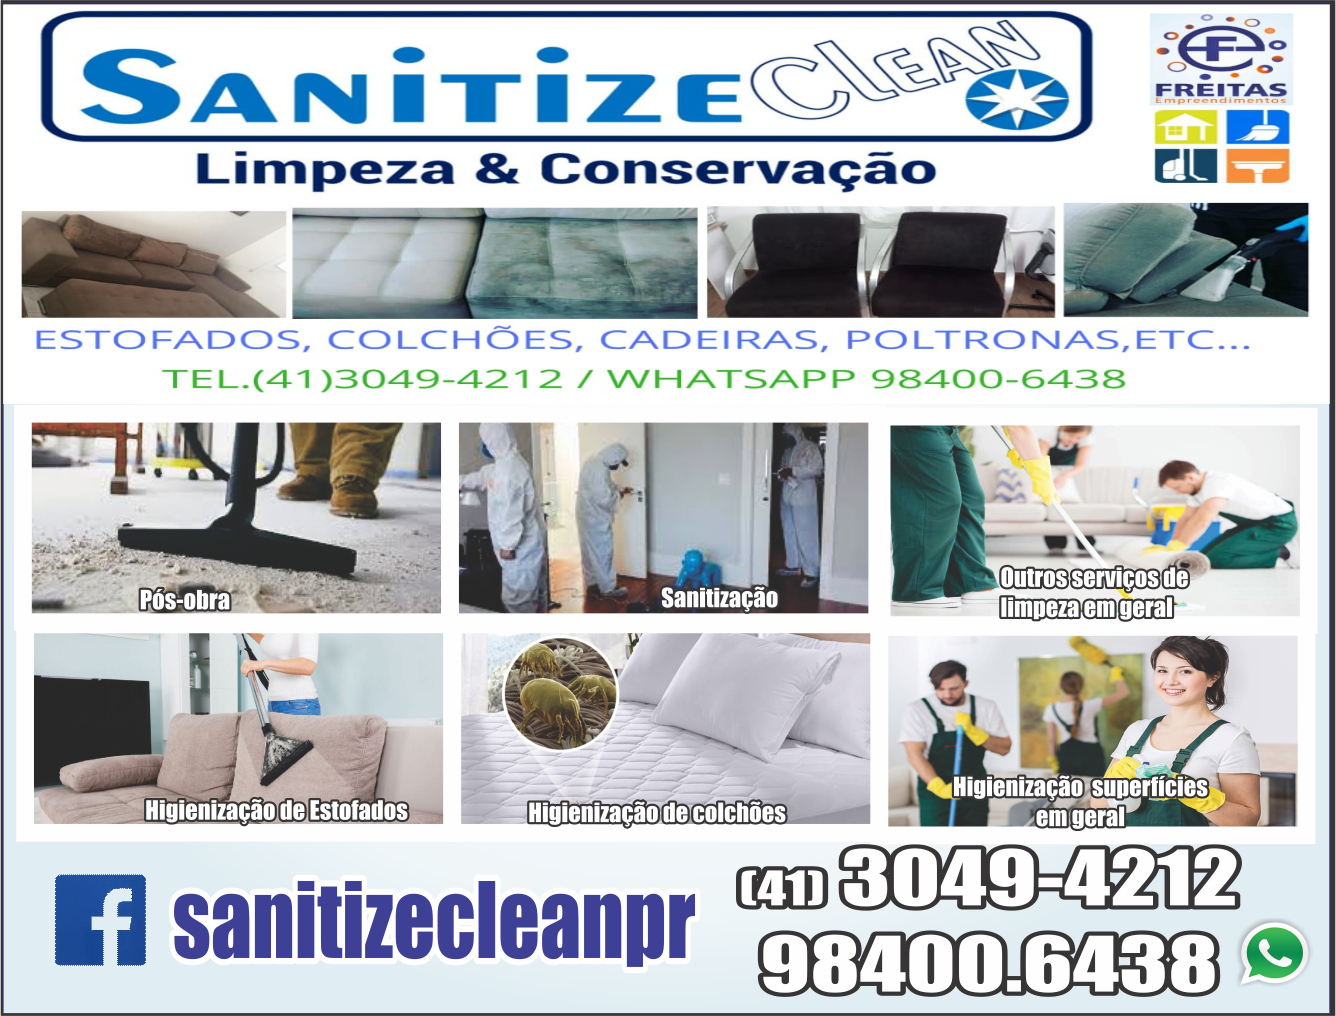 Sanitize Clean Limpeza e Conservação      Fones: (41)3049-4212 / (41) 98400-6438